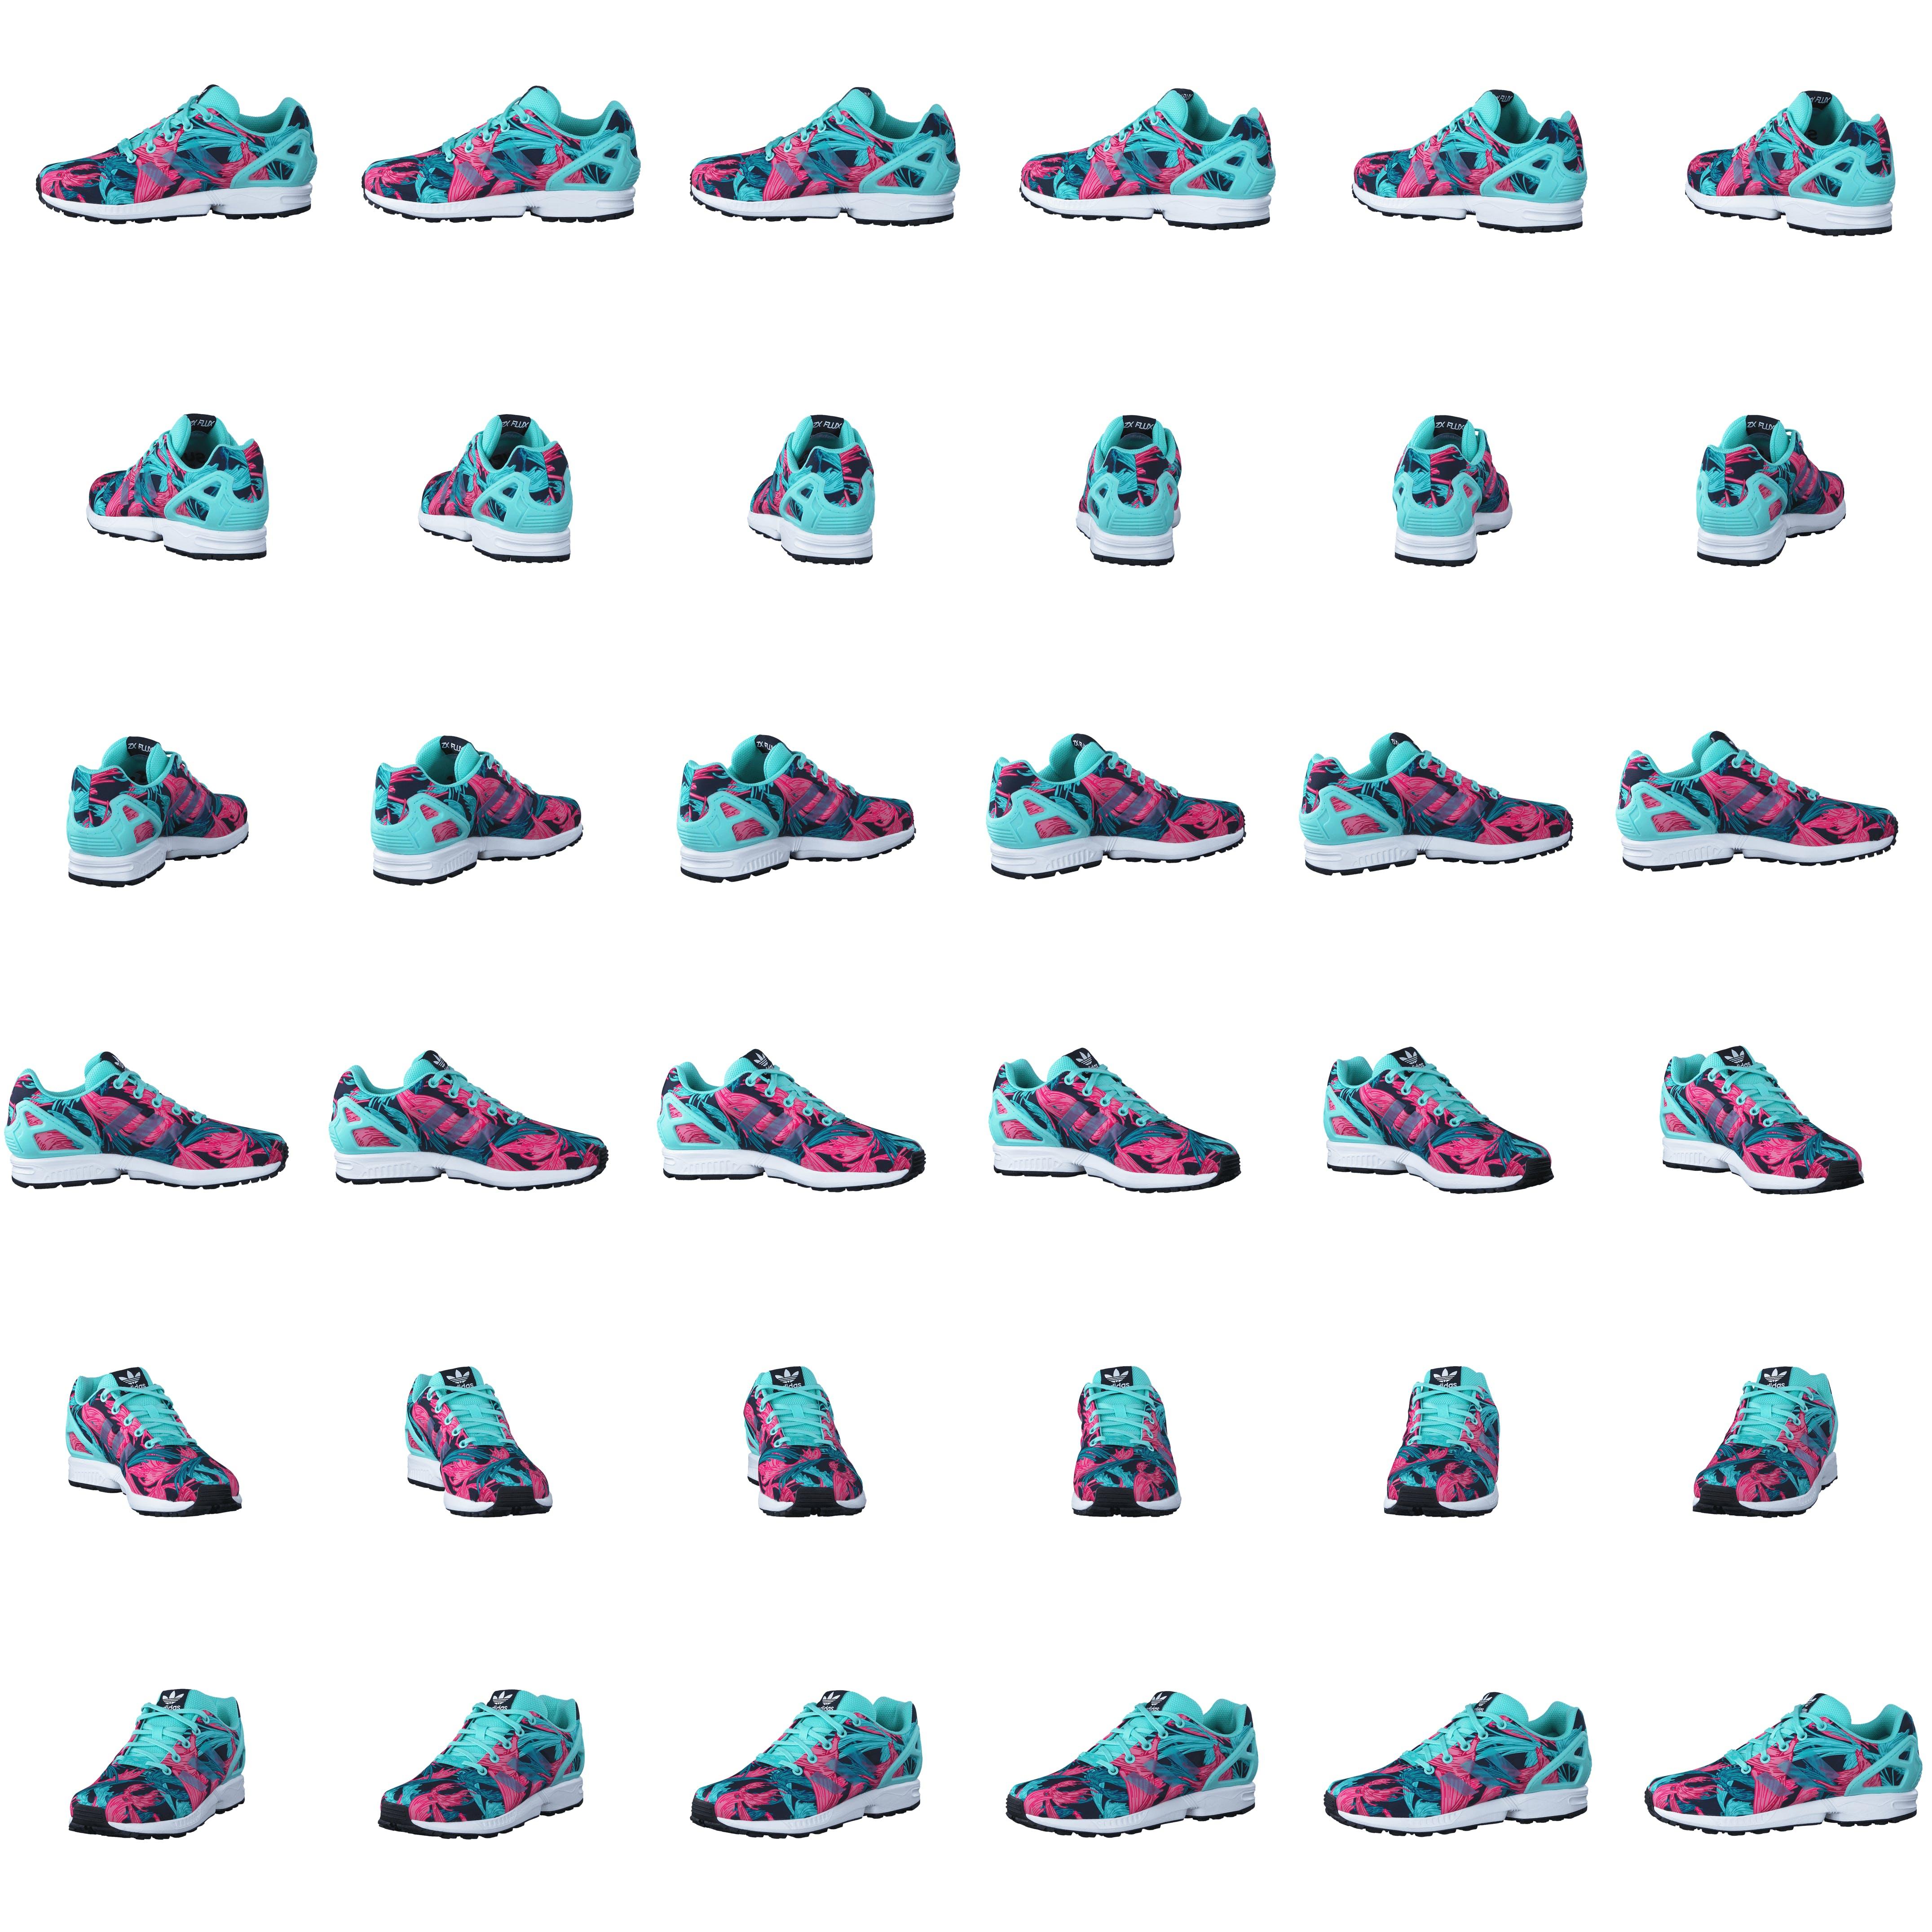 huge selection of b5b45 28c85 Buy adidas Originals Zx Flux J Energy Aqua F17 Energy Aqua F1 turquoise  Shoes Online   FOOTWAY.co.uk